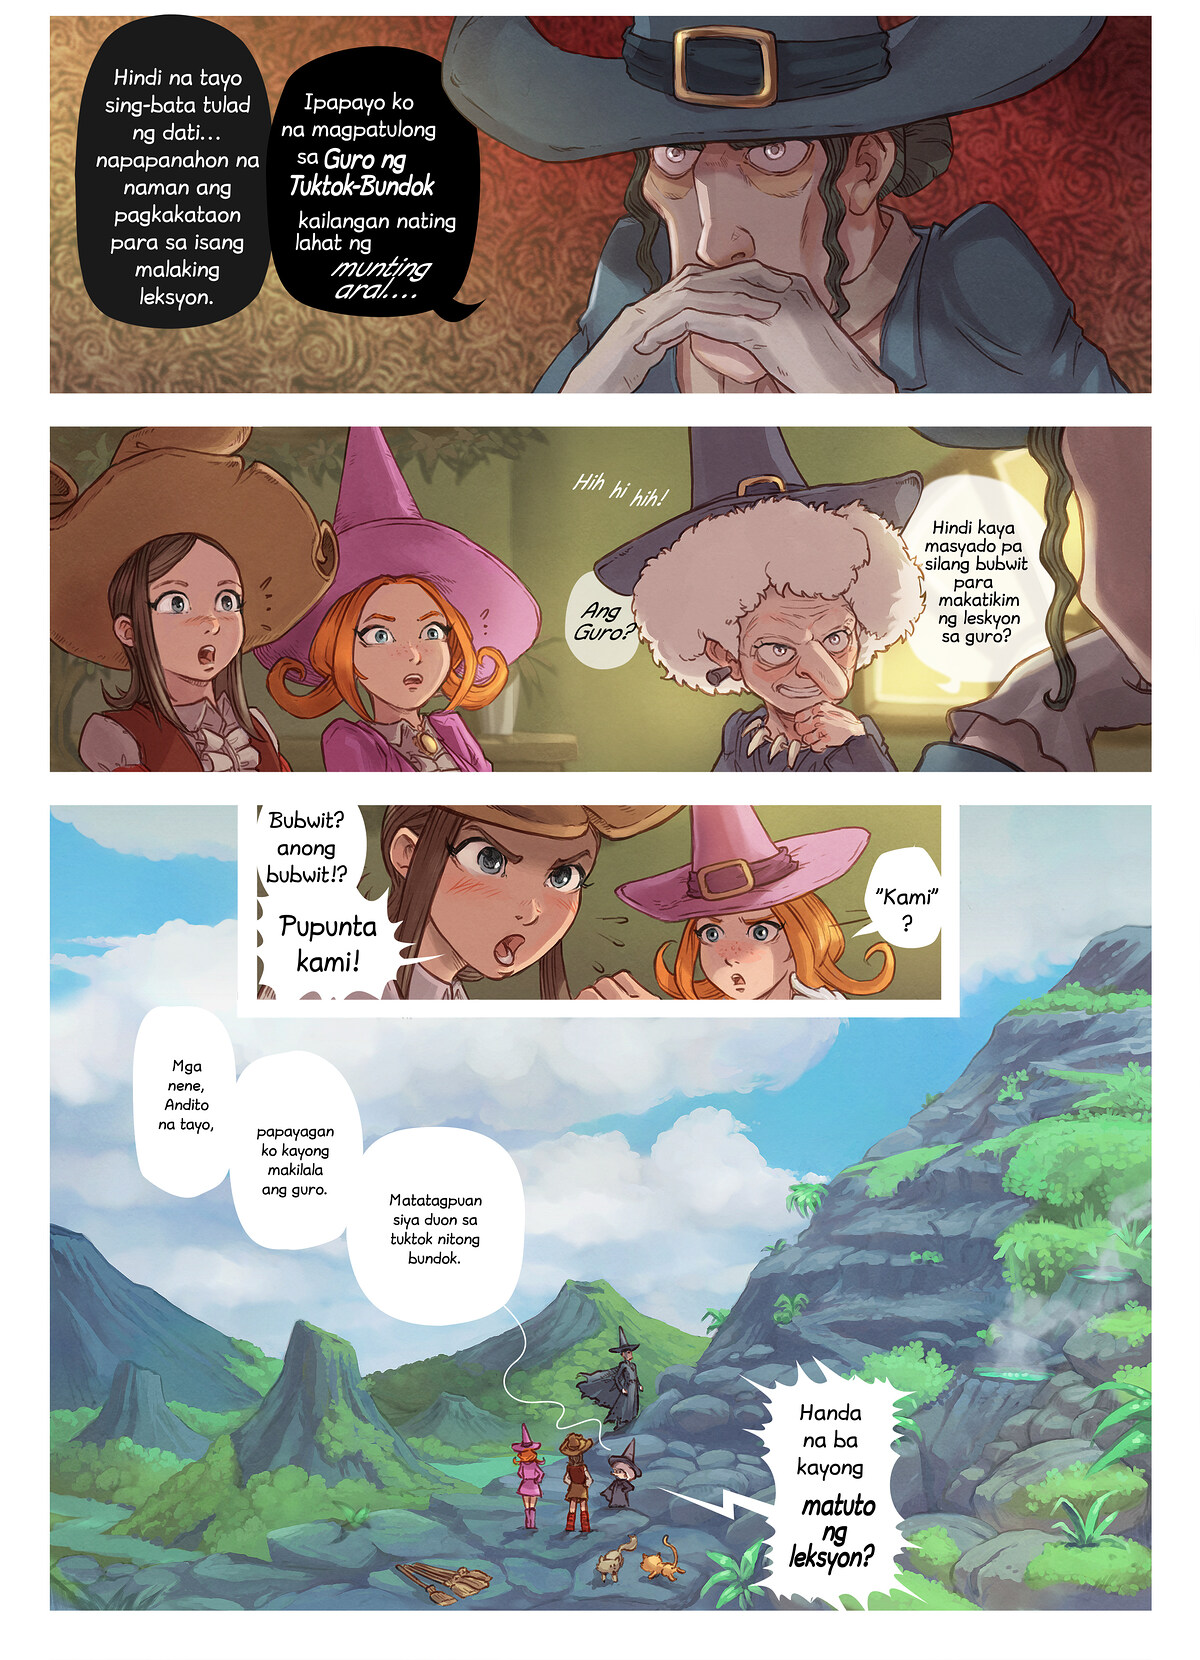 Episode 16 : Guro ng Tuktok-Bundok, Page 4